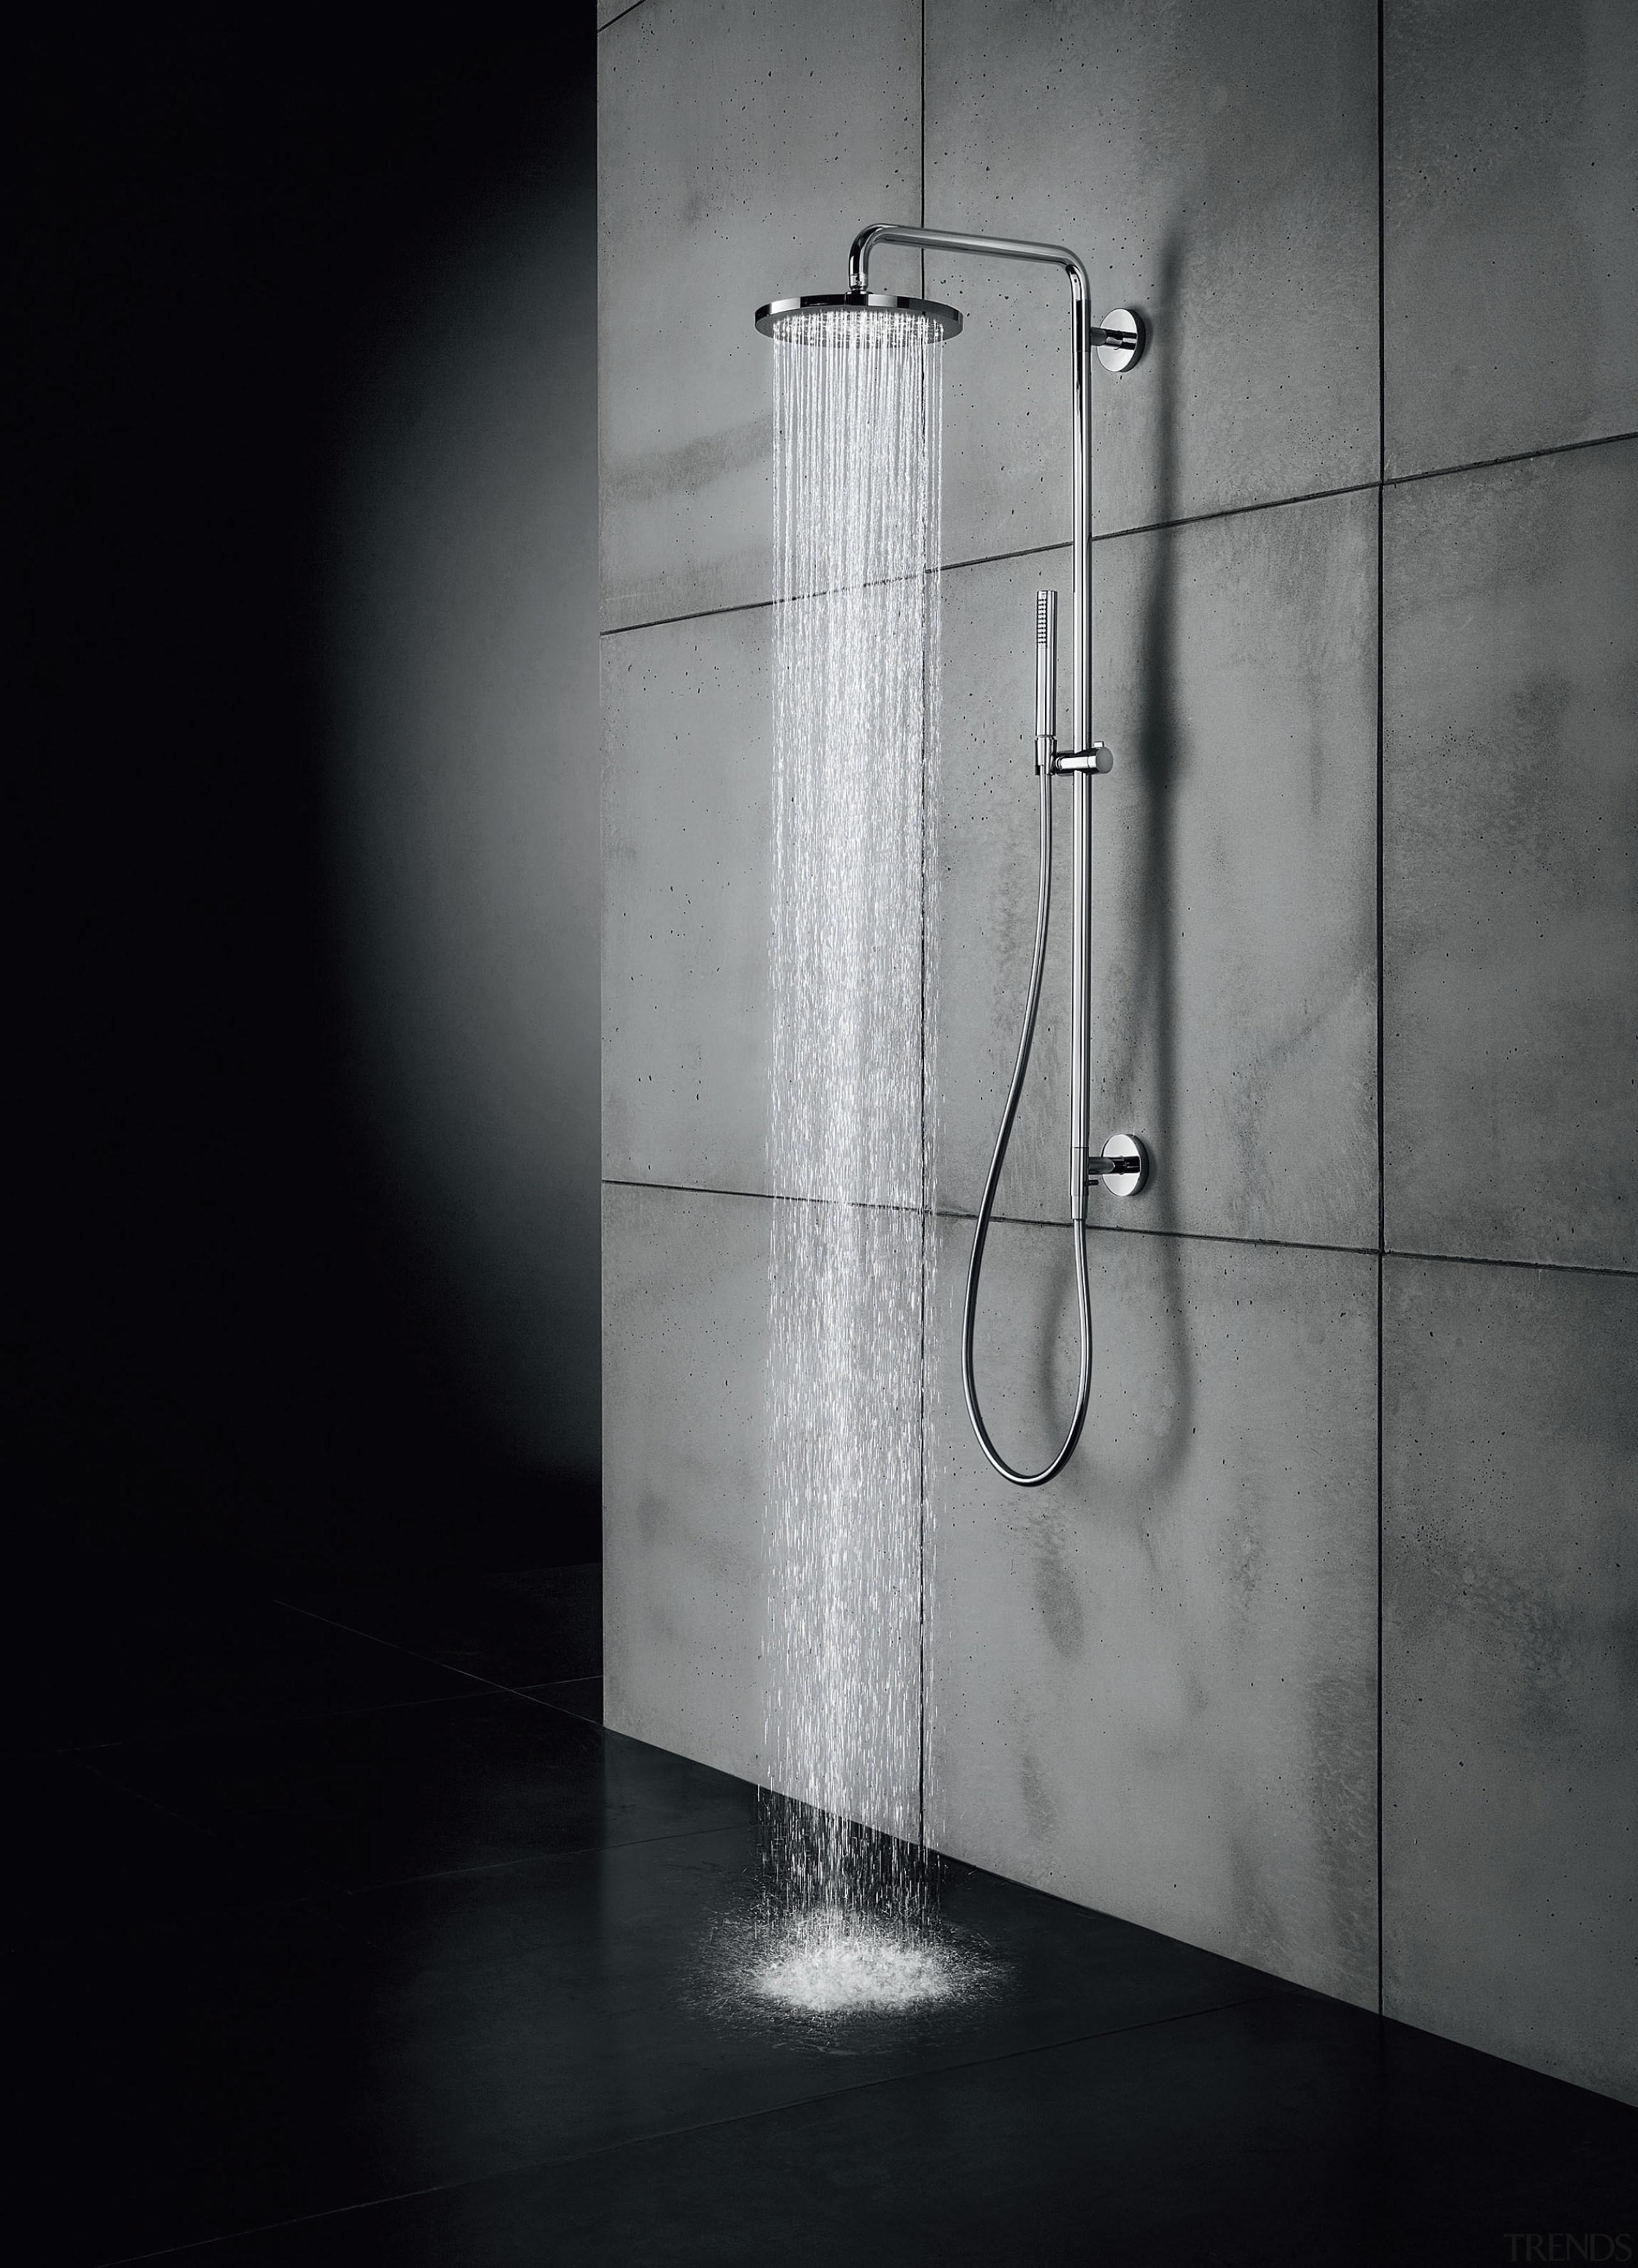 Simple water saving tips - angle | black angle, black and white, light, light fixture, lighting, plumbing fixture, shower, tap, black, gray